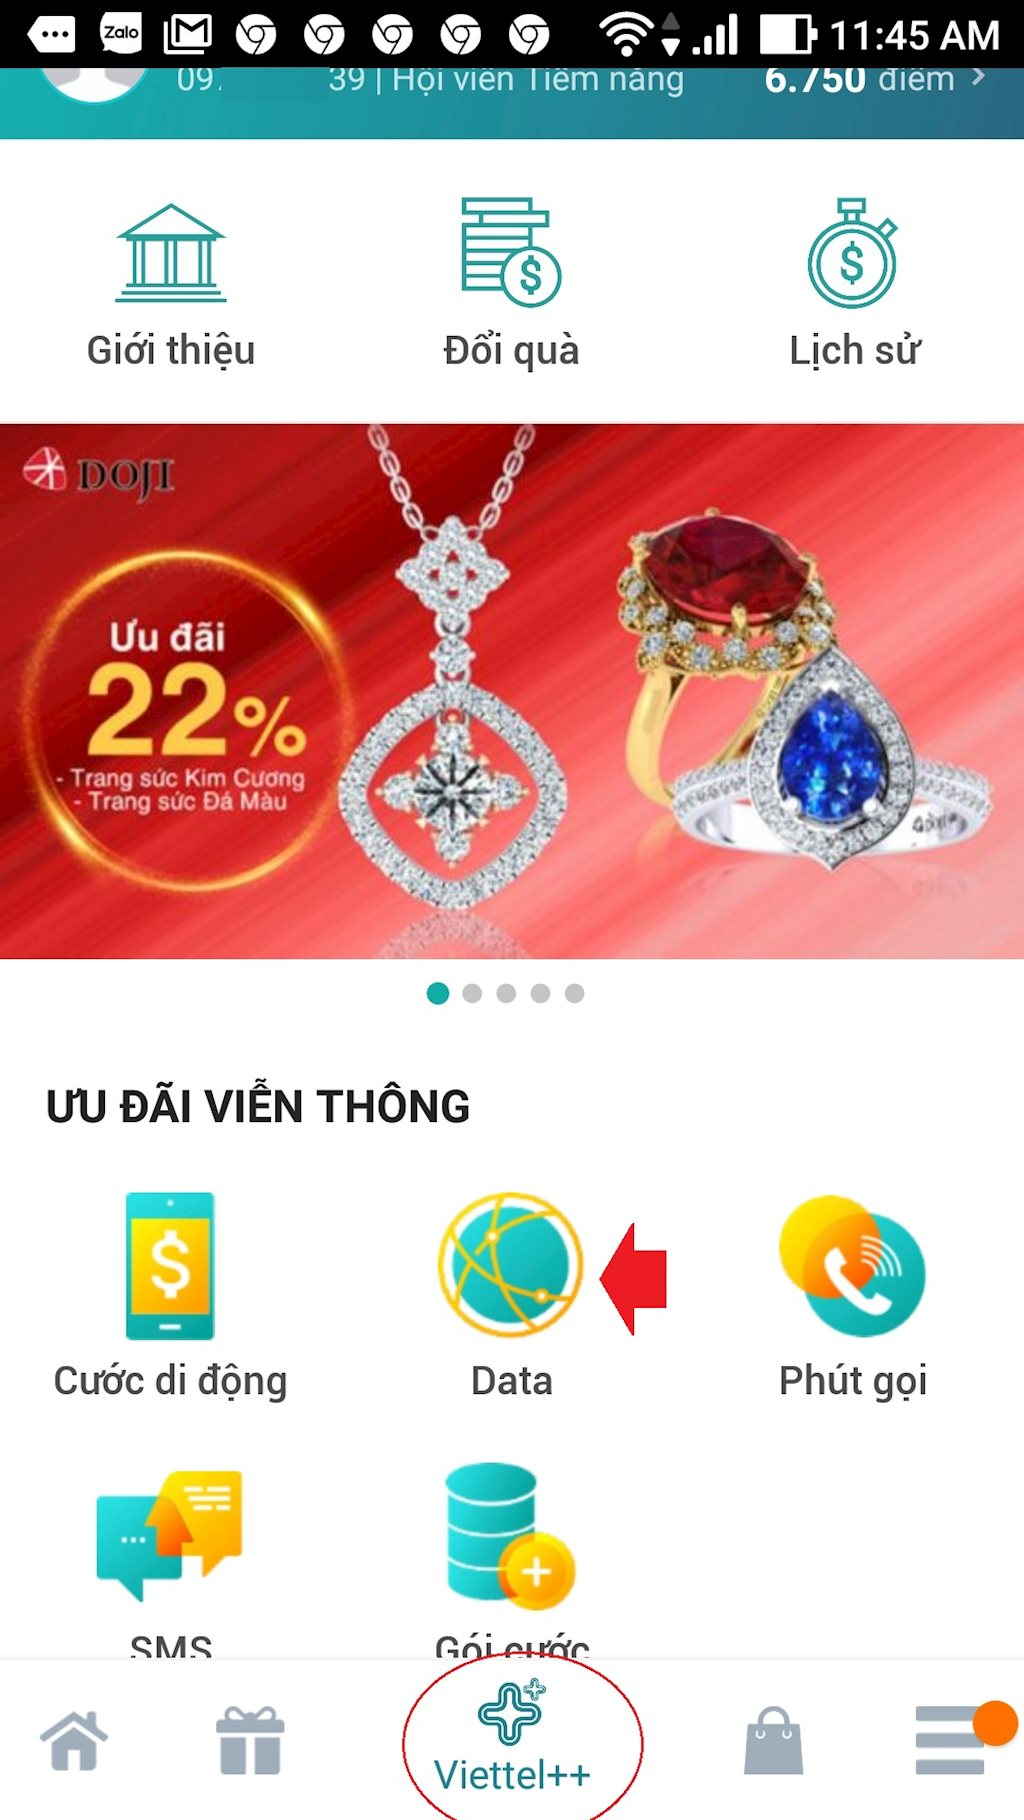 b1-huong-dan-doi-diem-viettel-lay-data-sang-sms-cach-doi-diem-viettel-plus-lay-the-cao-sang-phut-goi-screenshot_20191018-114549.jpg